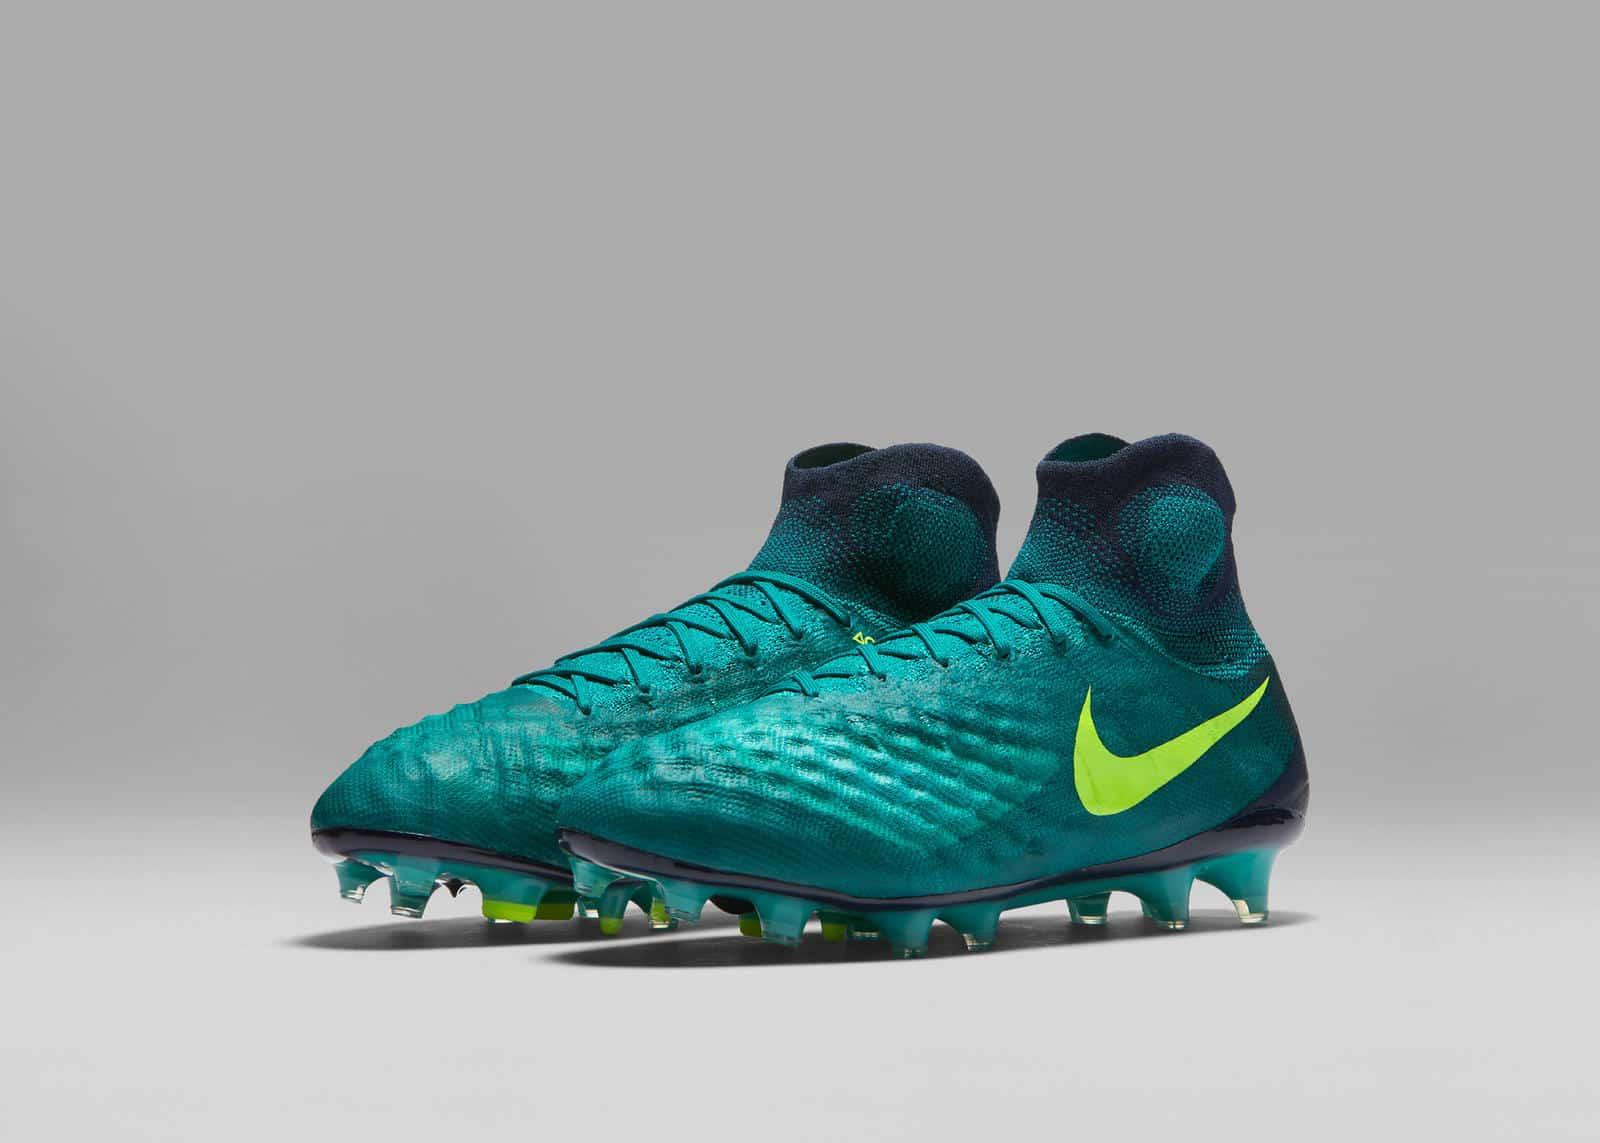 chaussure-football-nike-magista-pack-floodlights-3